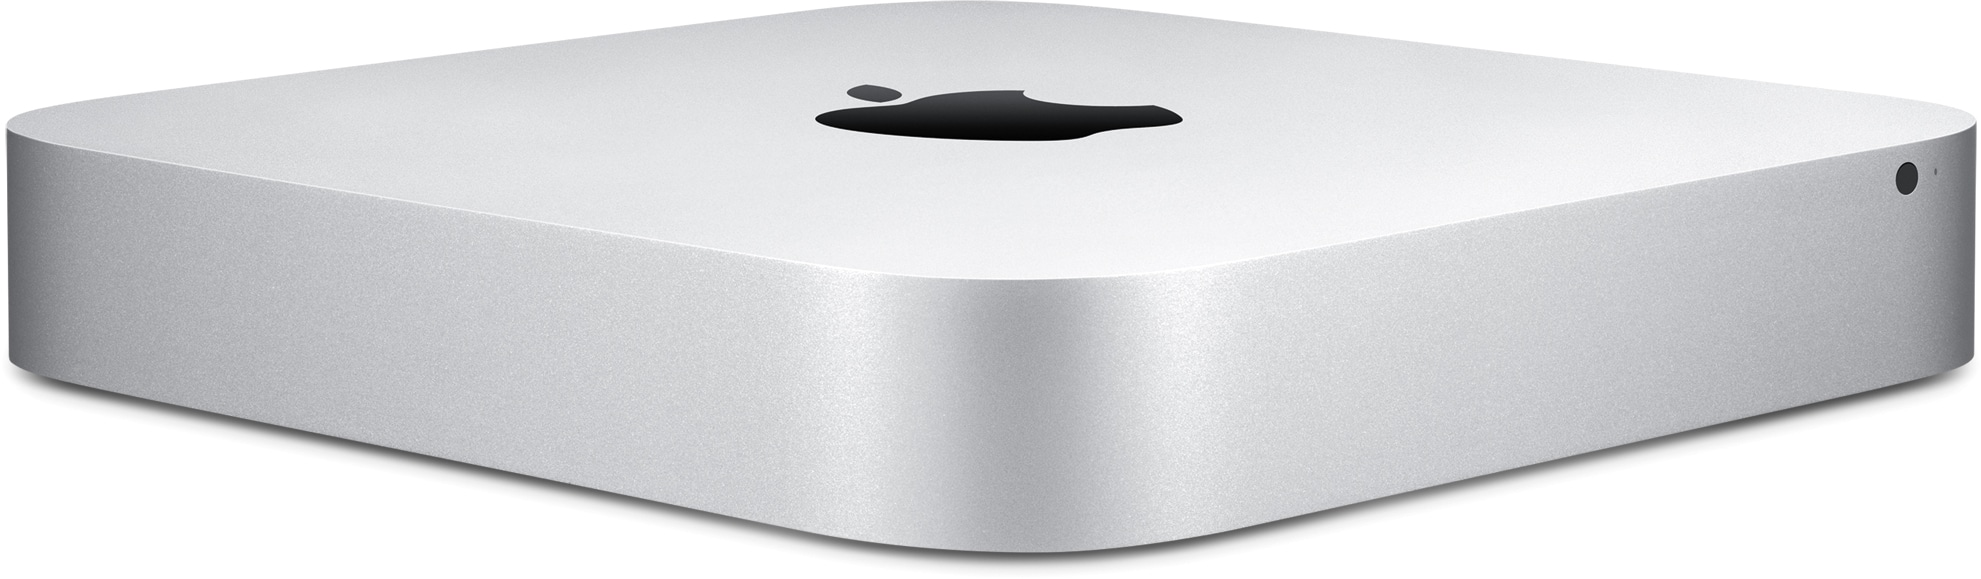 Nuevo Mac mini frontal y lateral